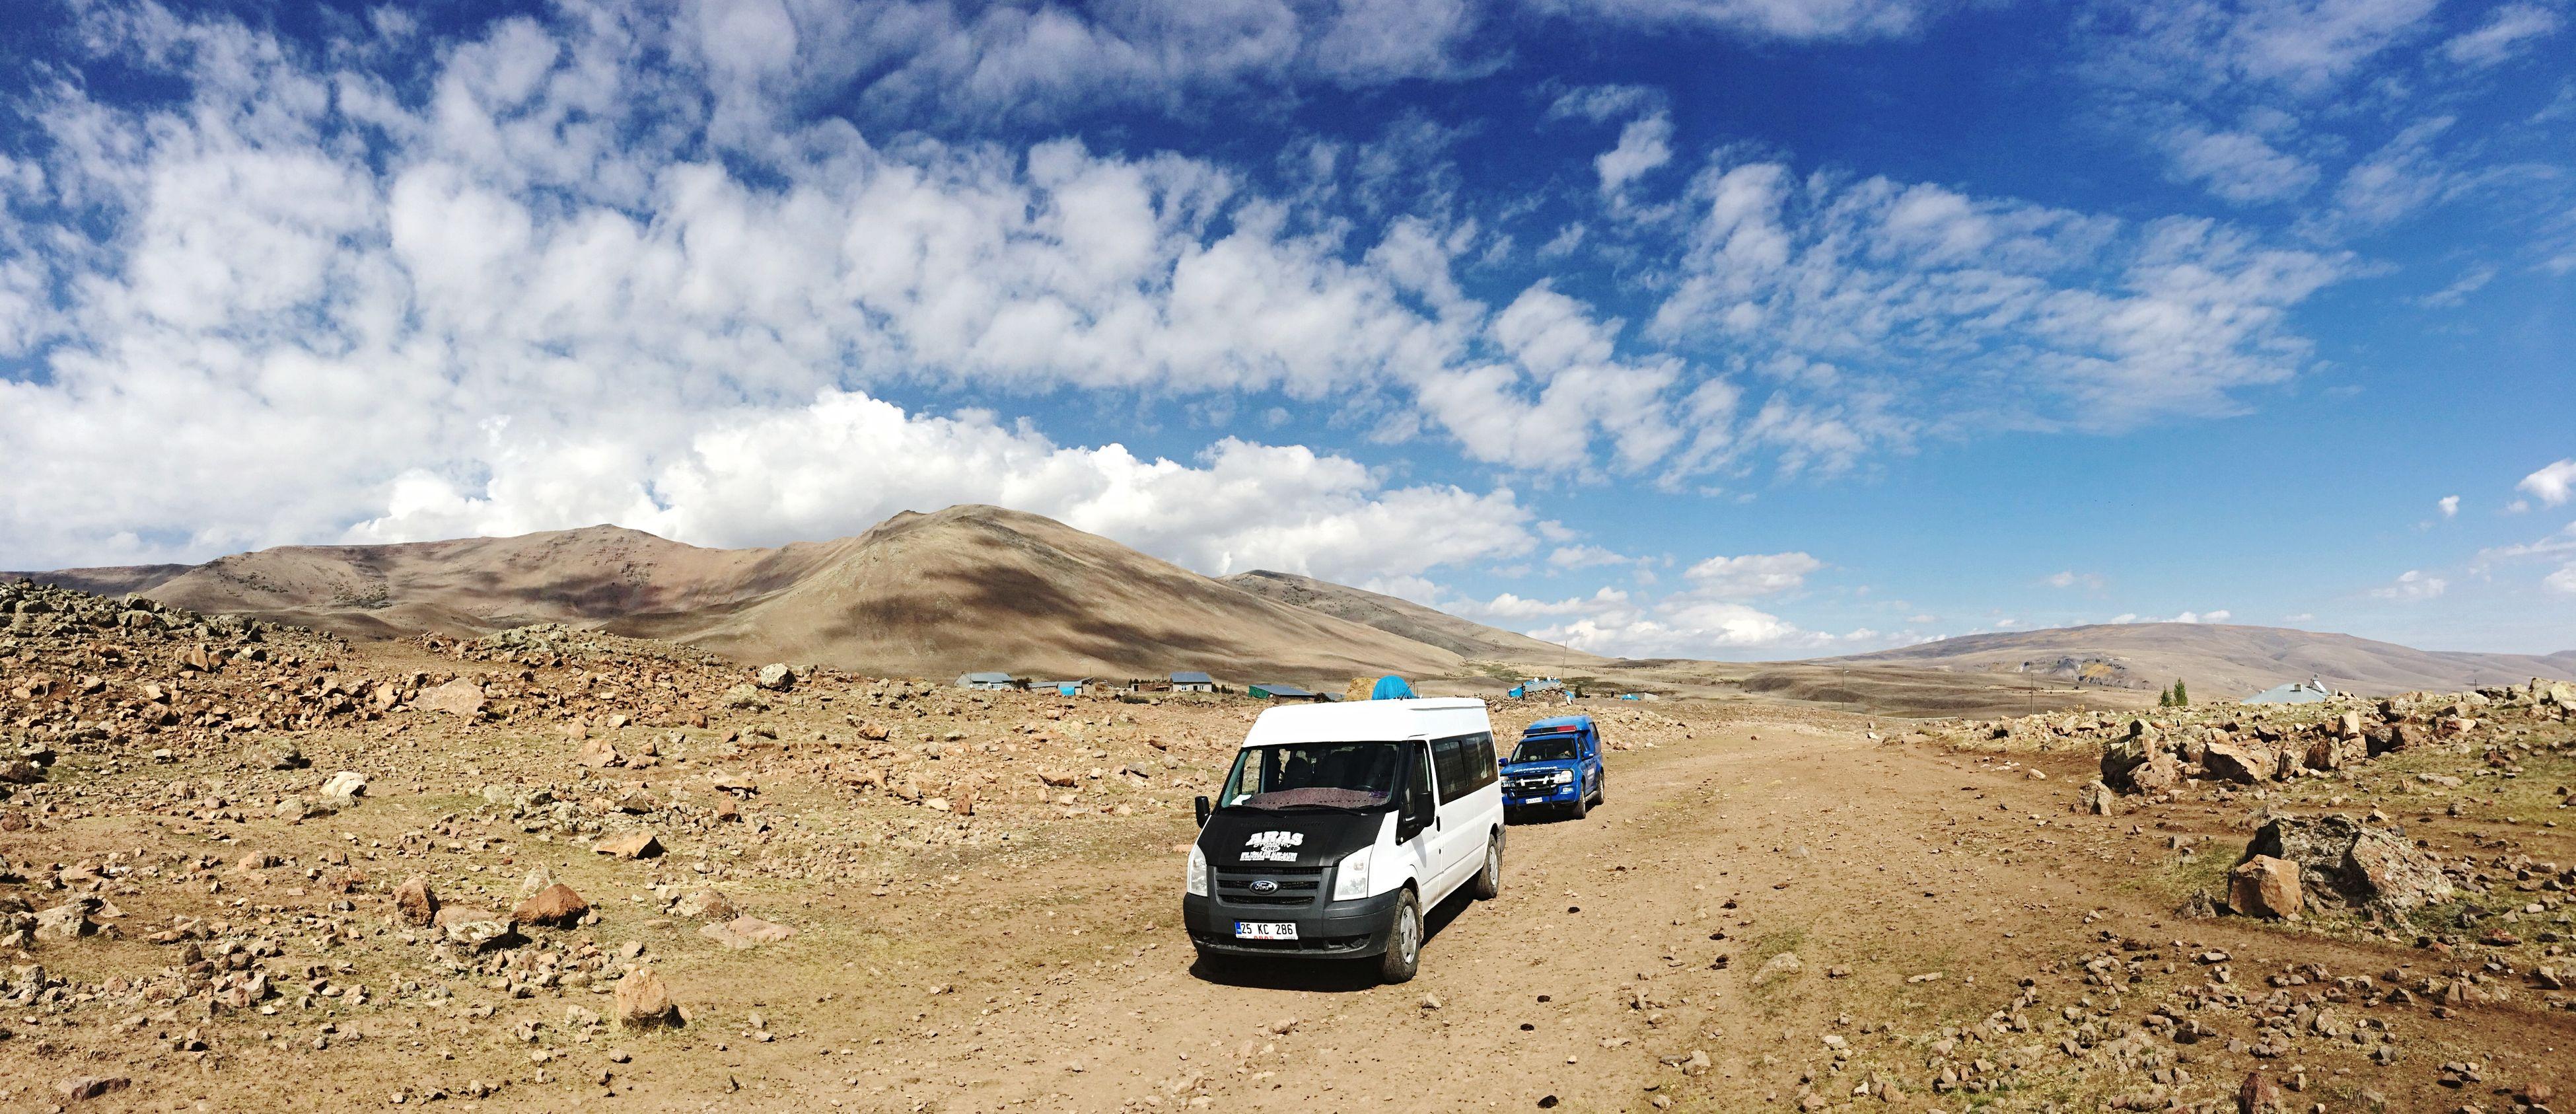 Erzurum Hasandede Mountains Nature Keşif Zamanı